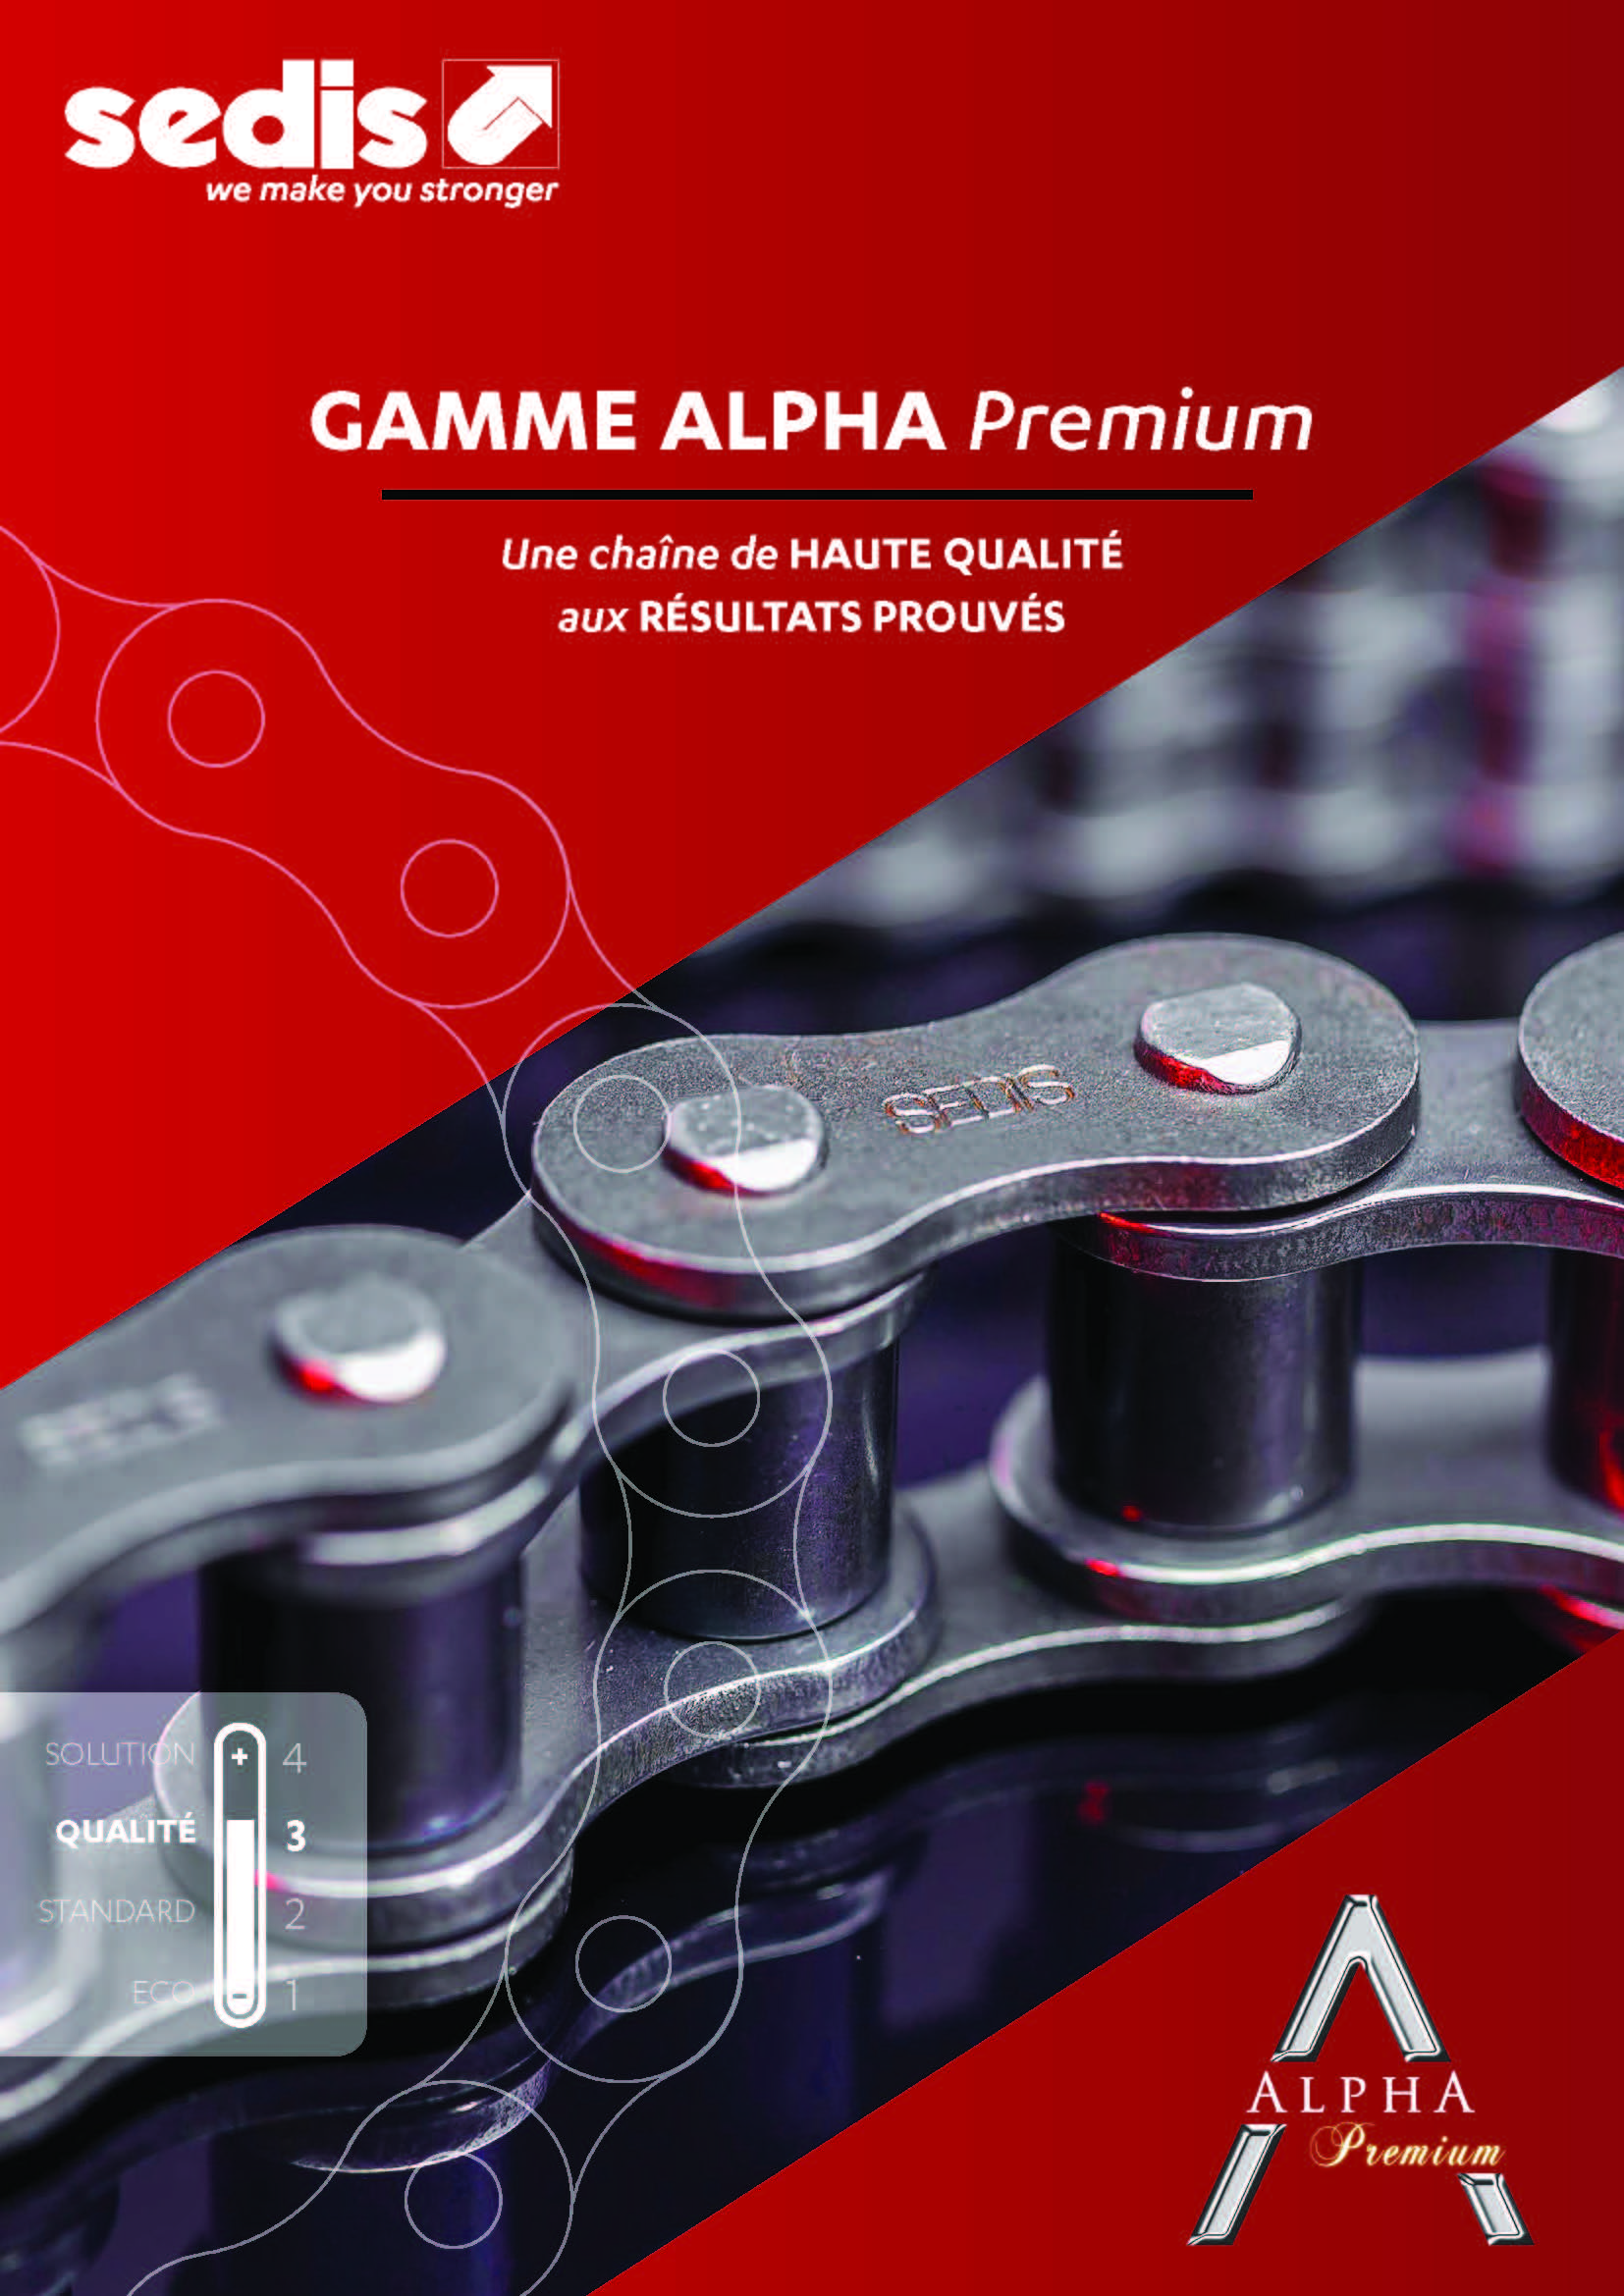 Gamme Alpha Premium